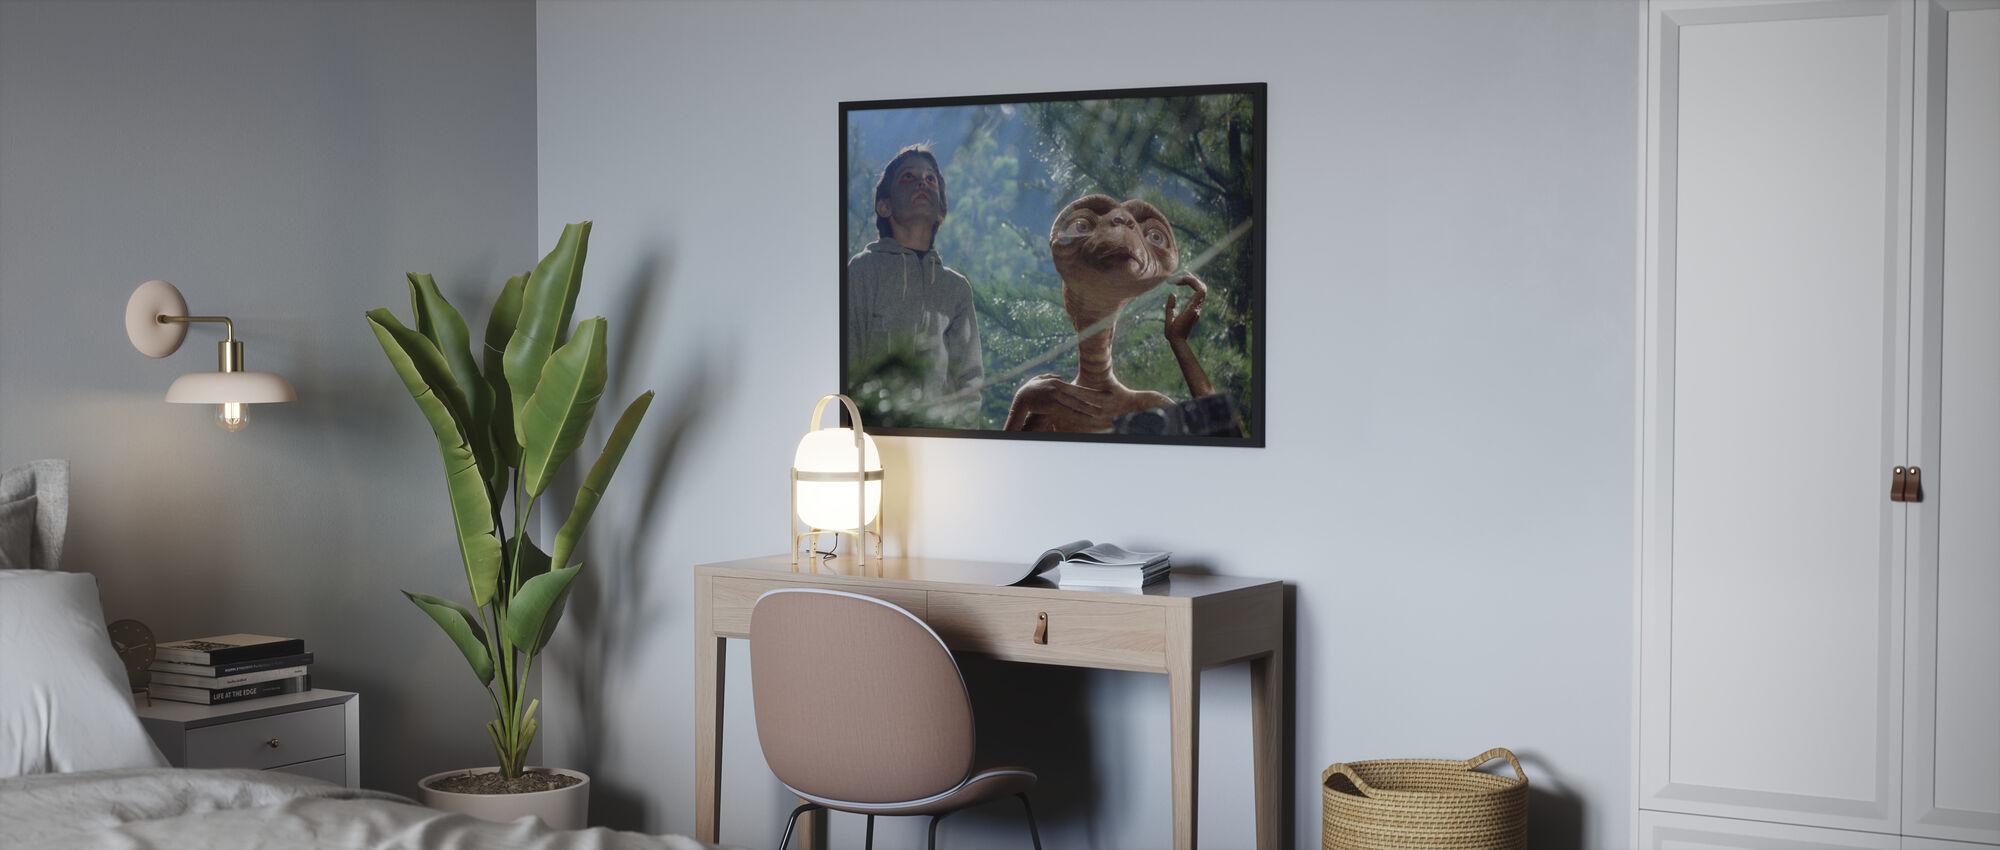 Extra Terrestrial - Henry Thomas - Poster - Bedroom